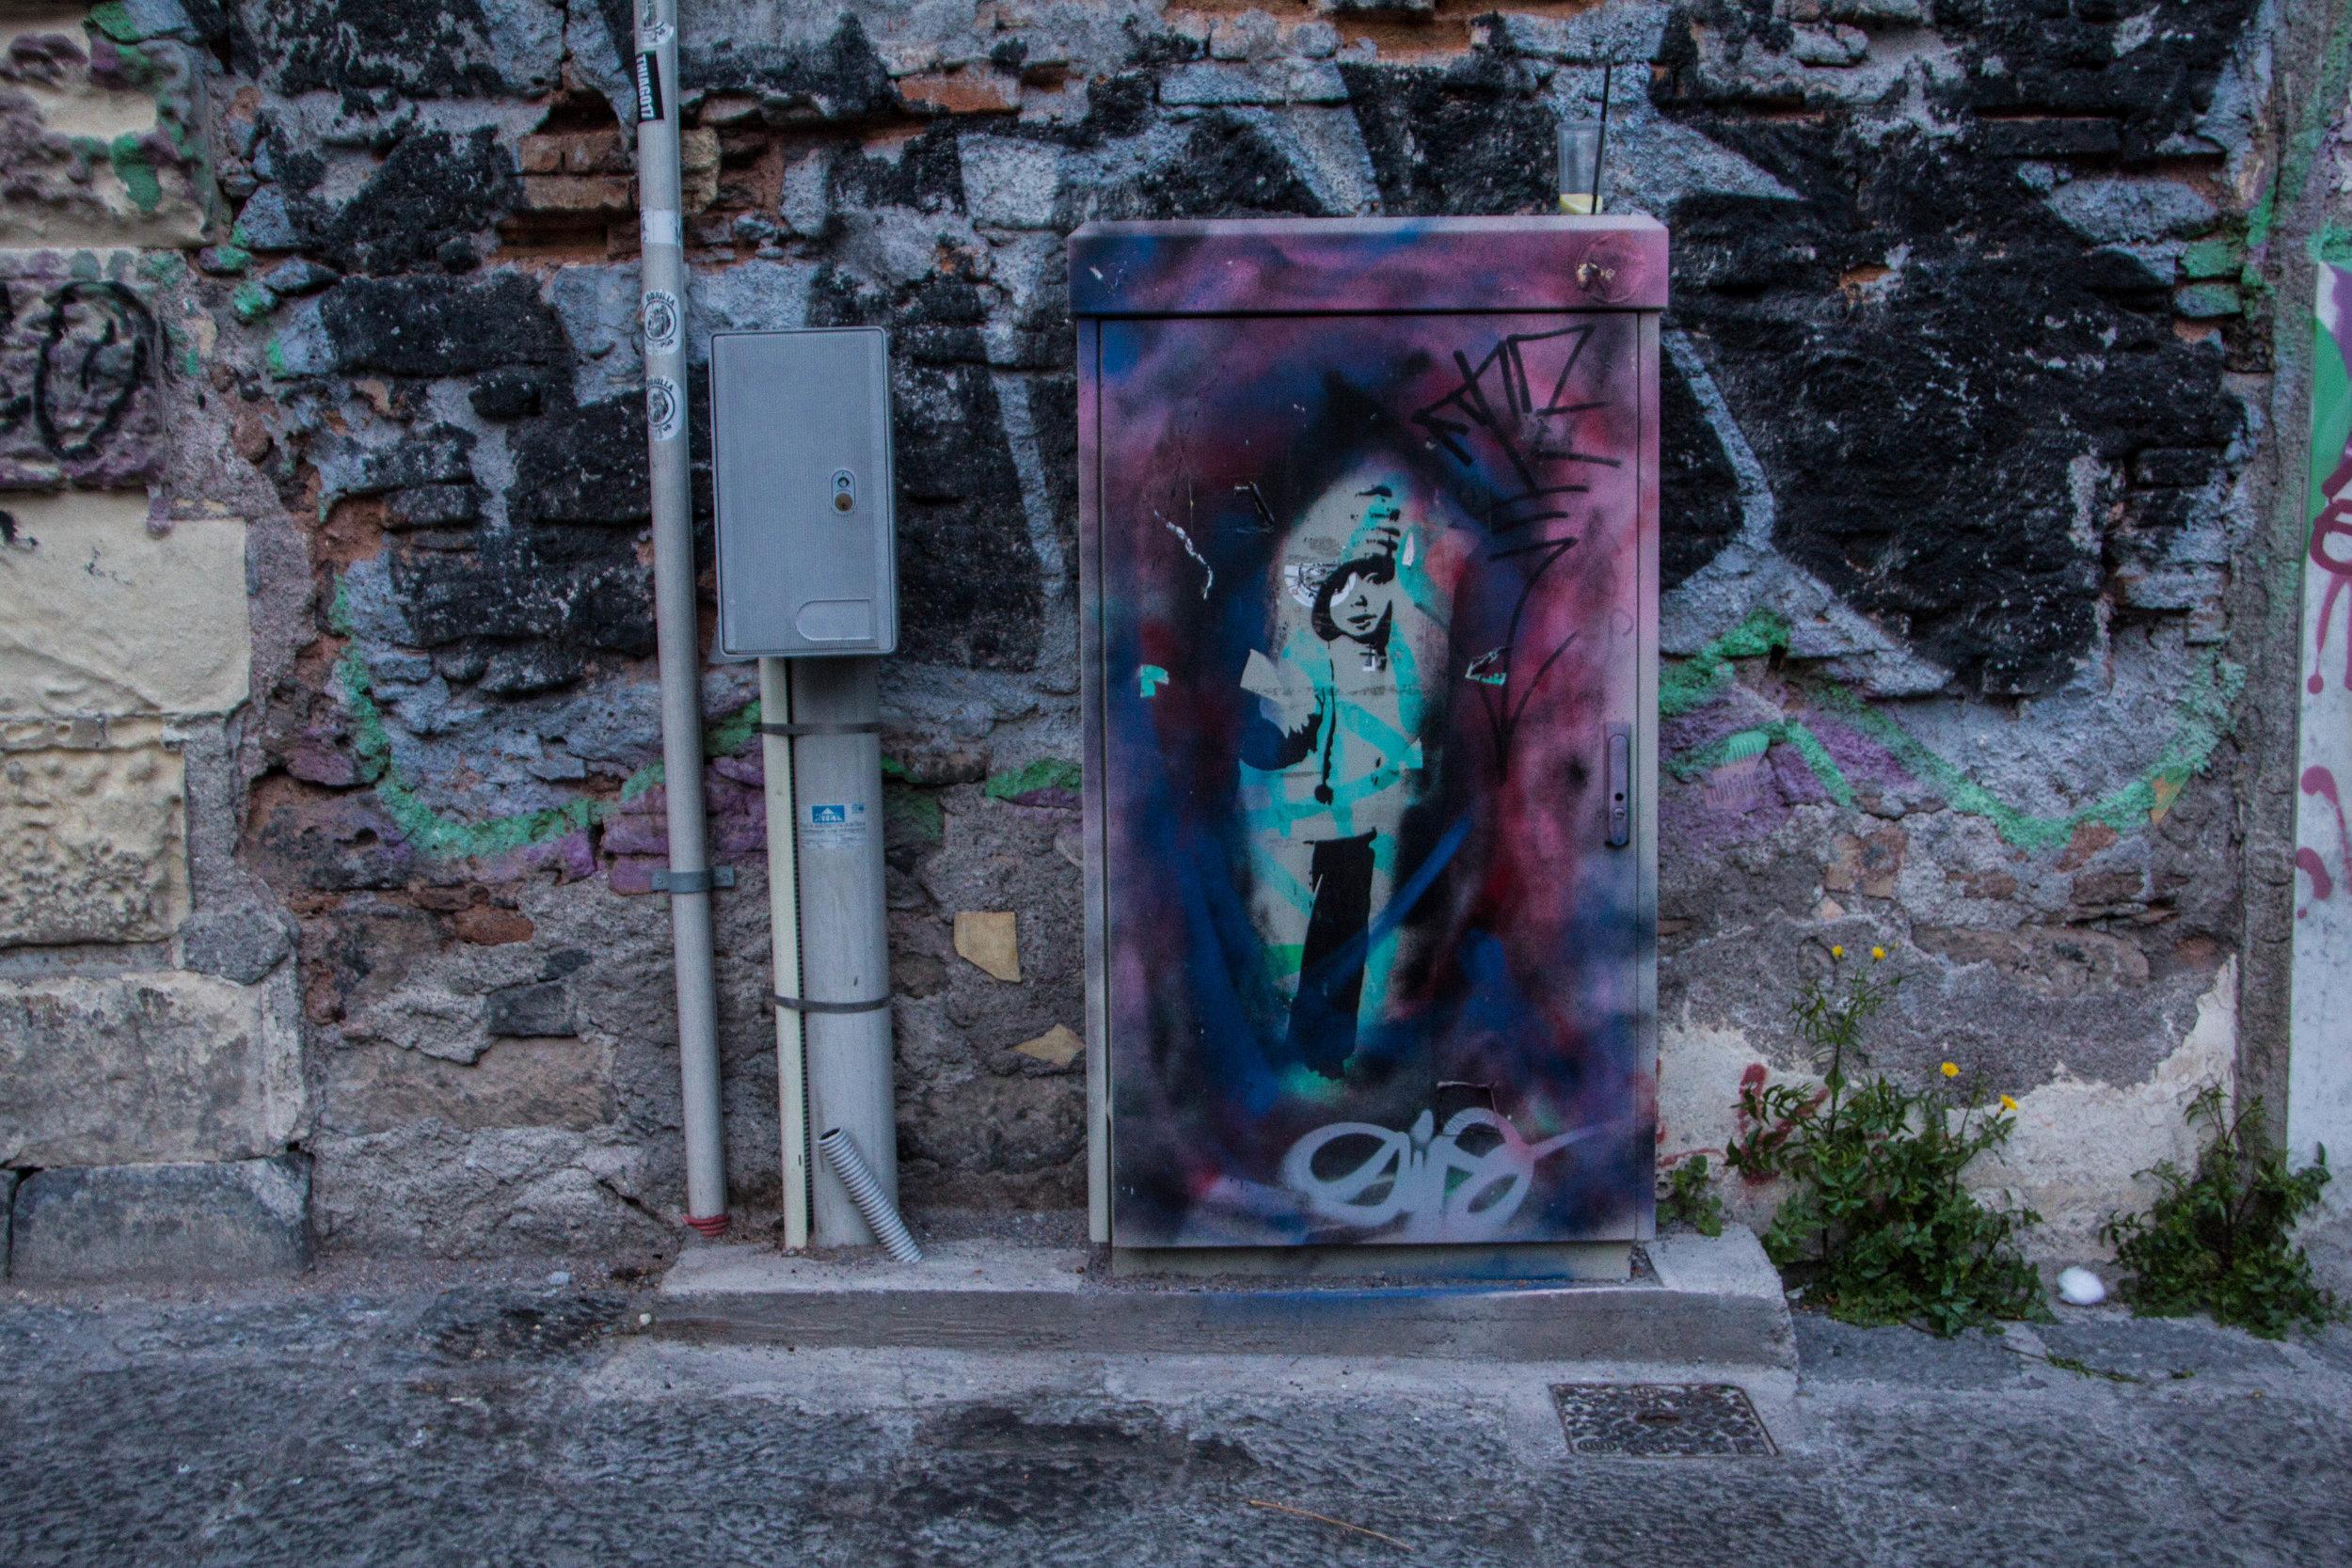 street-art-catania-sicily-sicilia-39.jpg